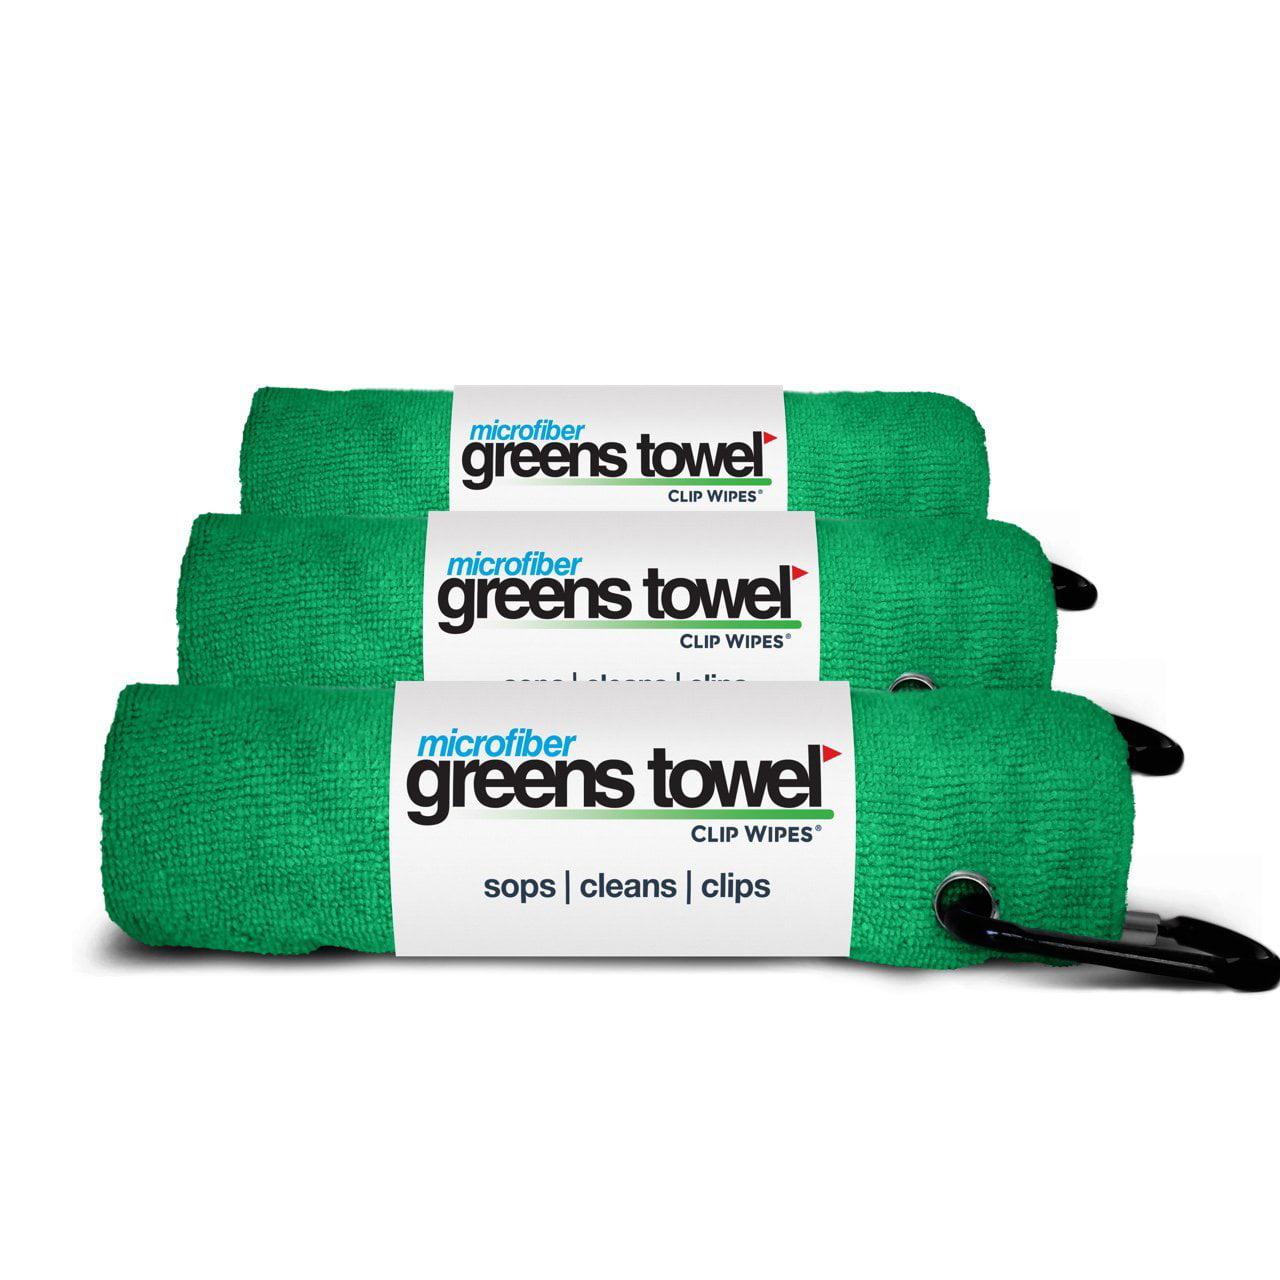 Microfiber Greens Towel Jet Black 3 Pack